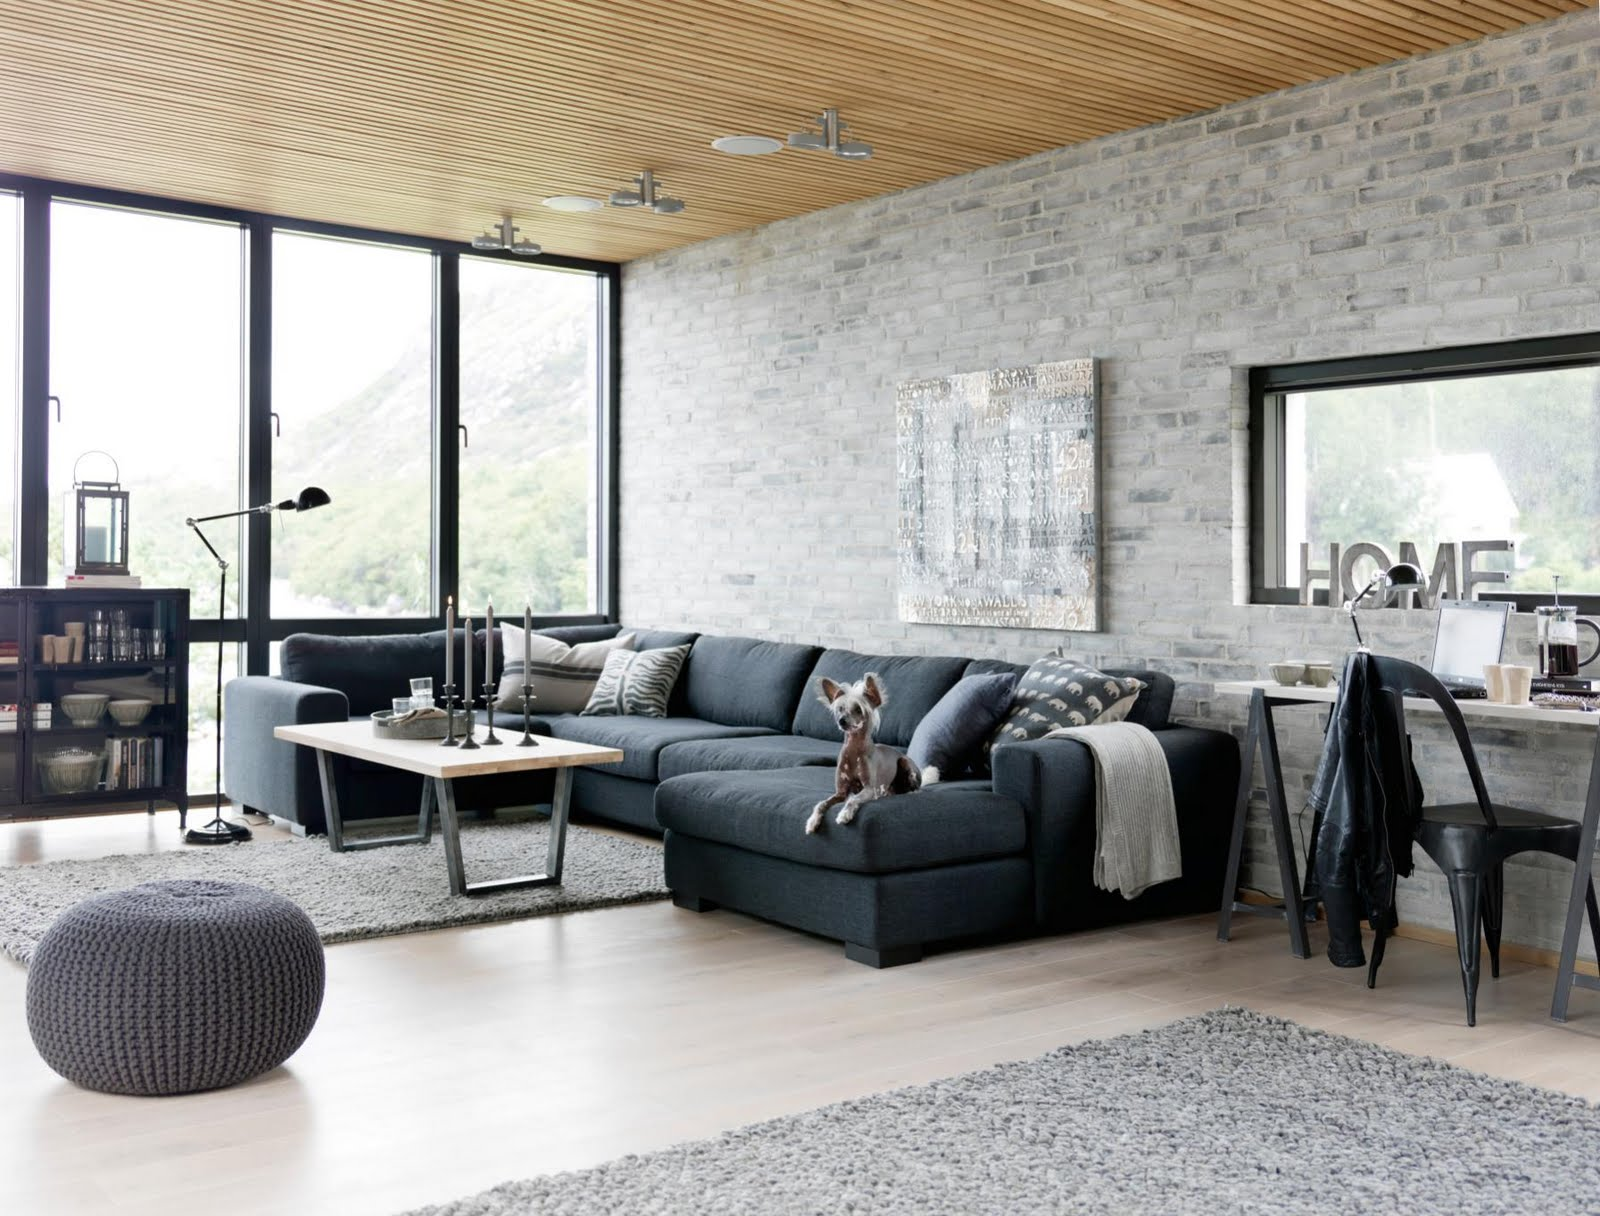 Exquisite-Industrial-Living-room